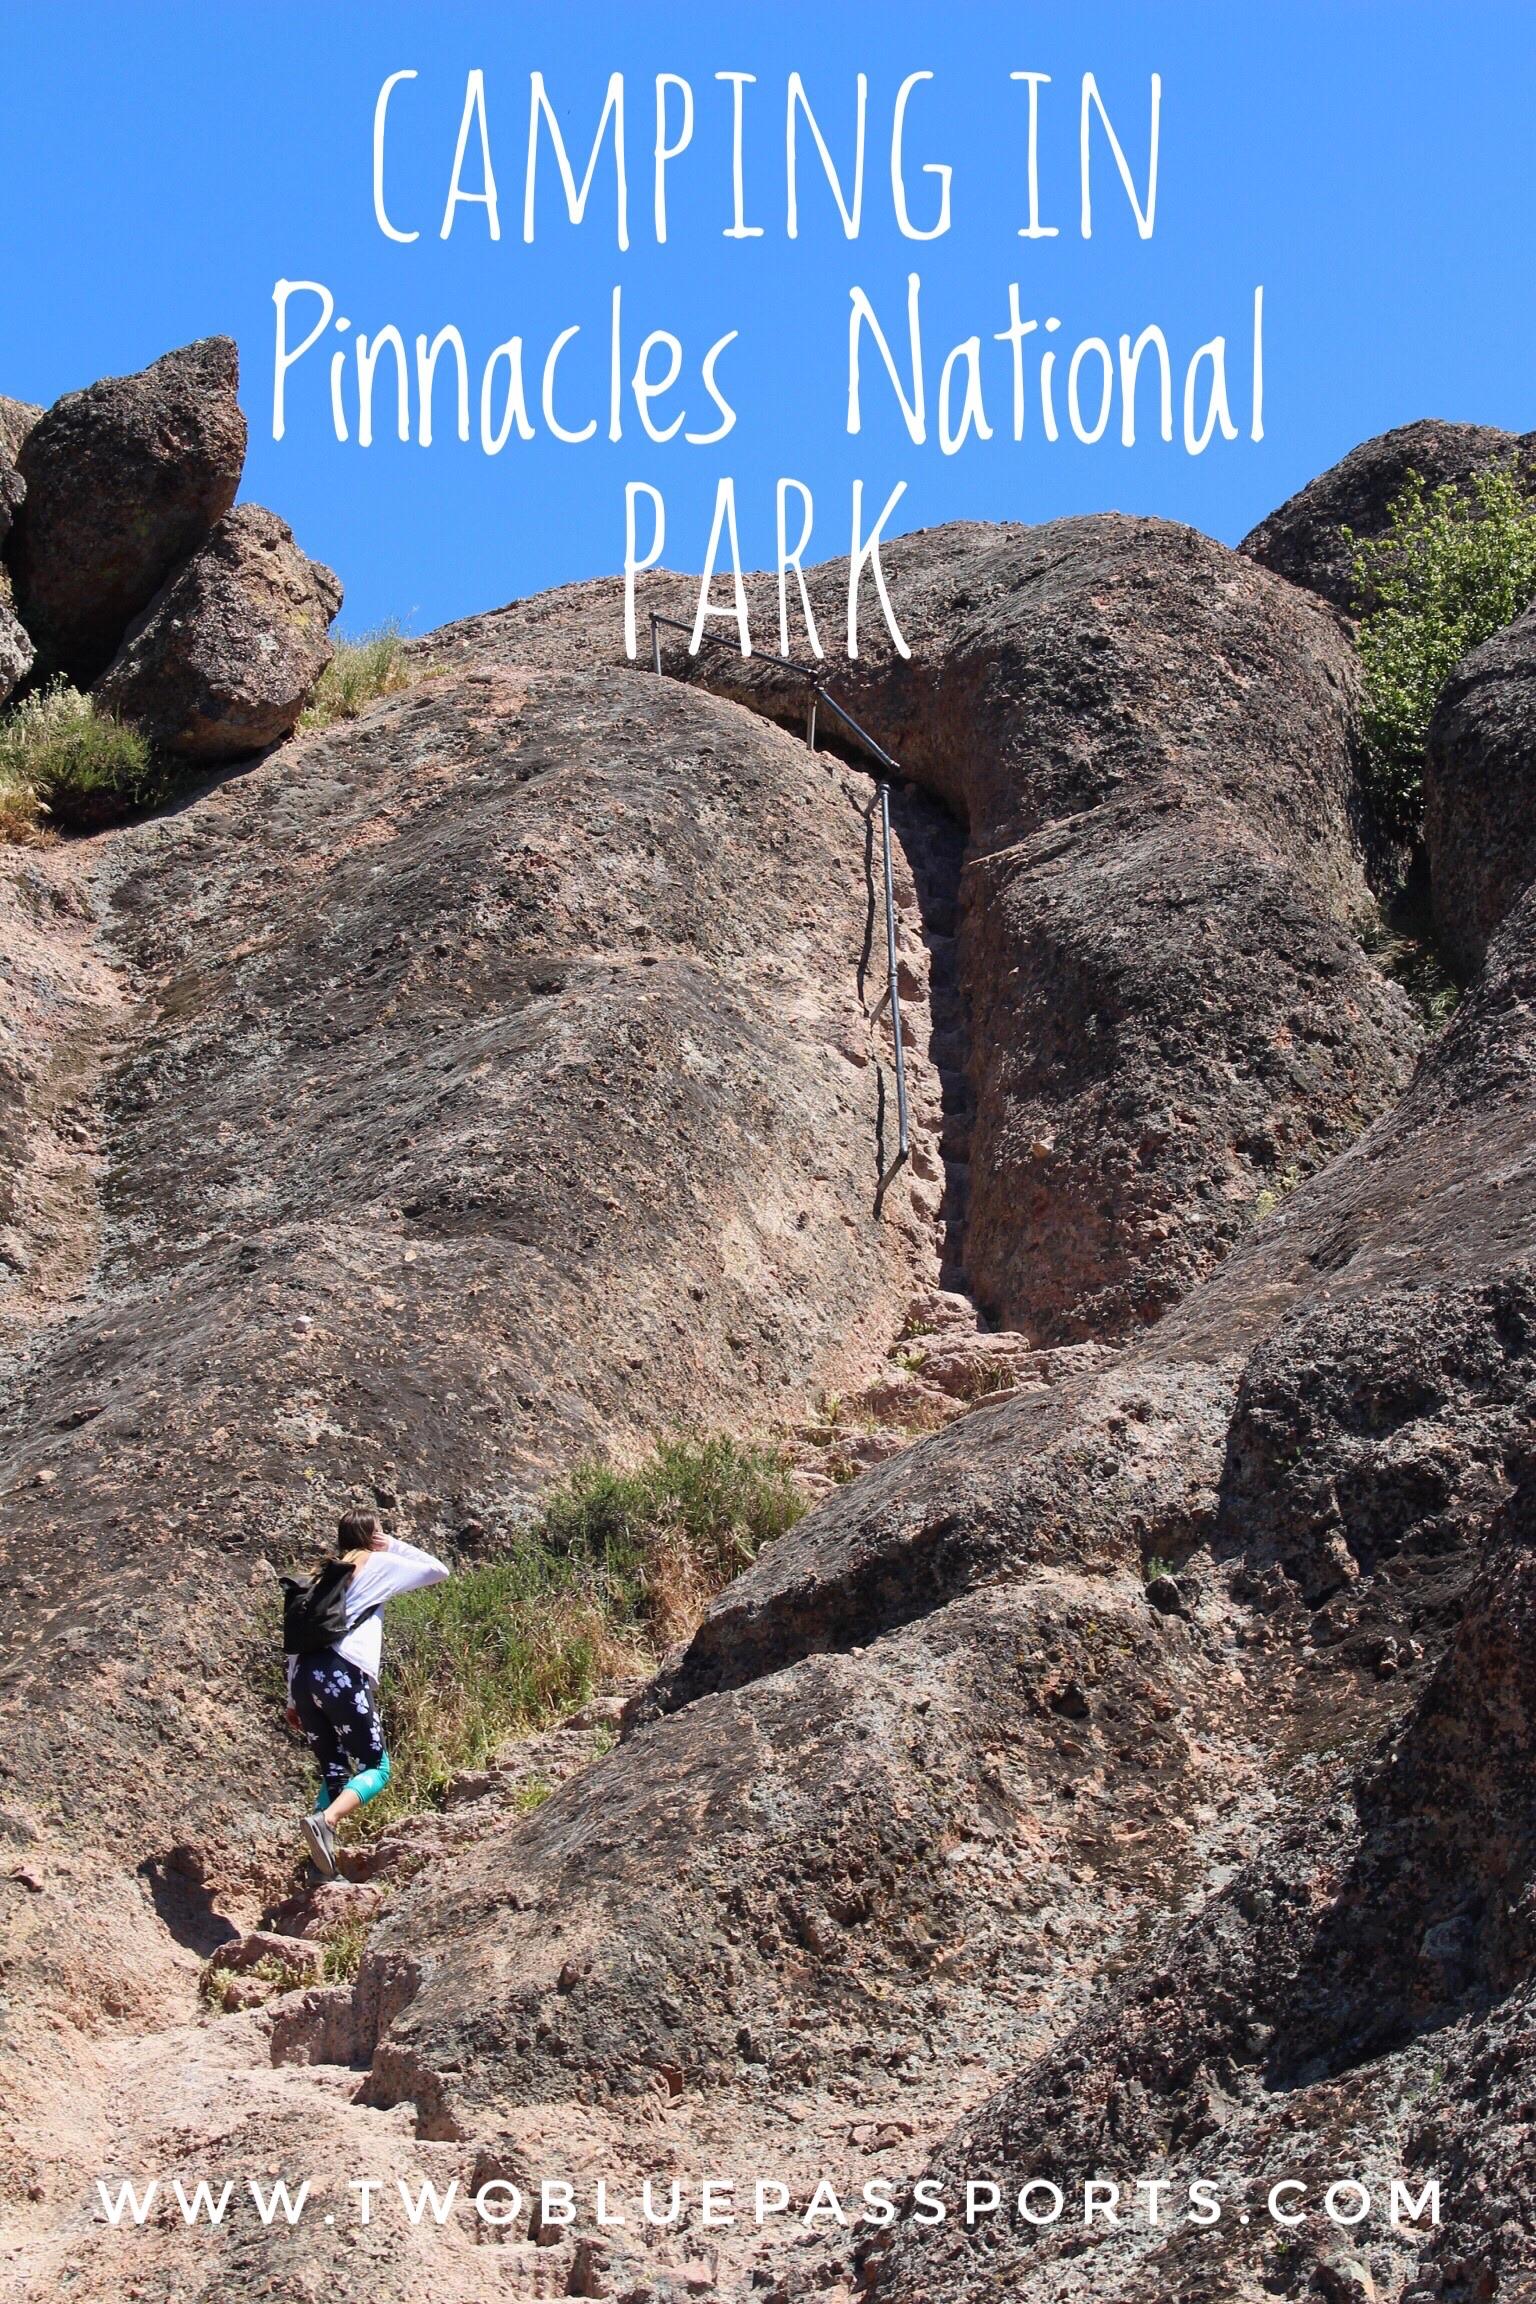 camping-in-pinnacles-national-park-california.jpg